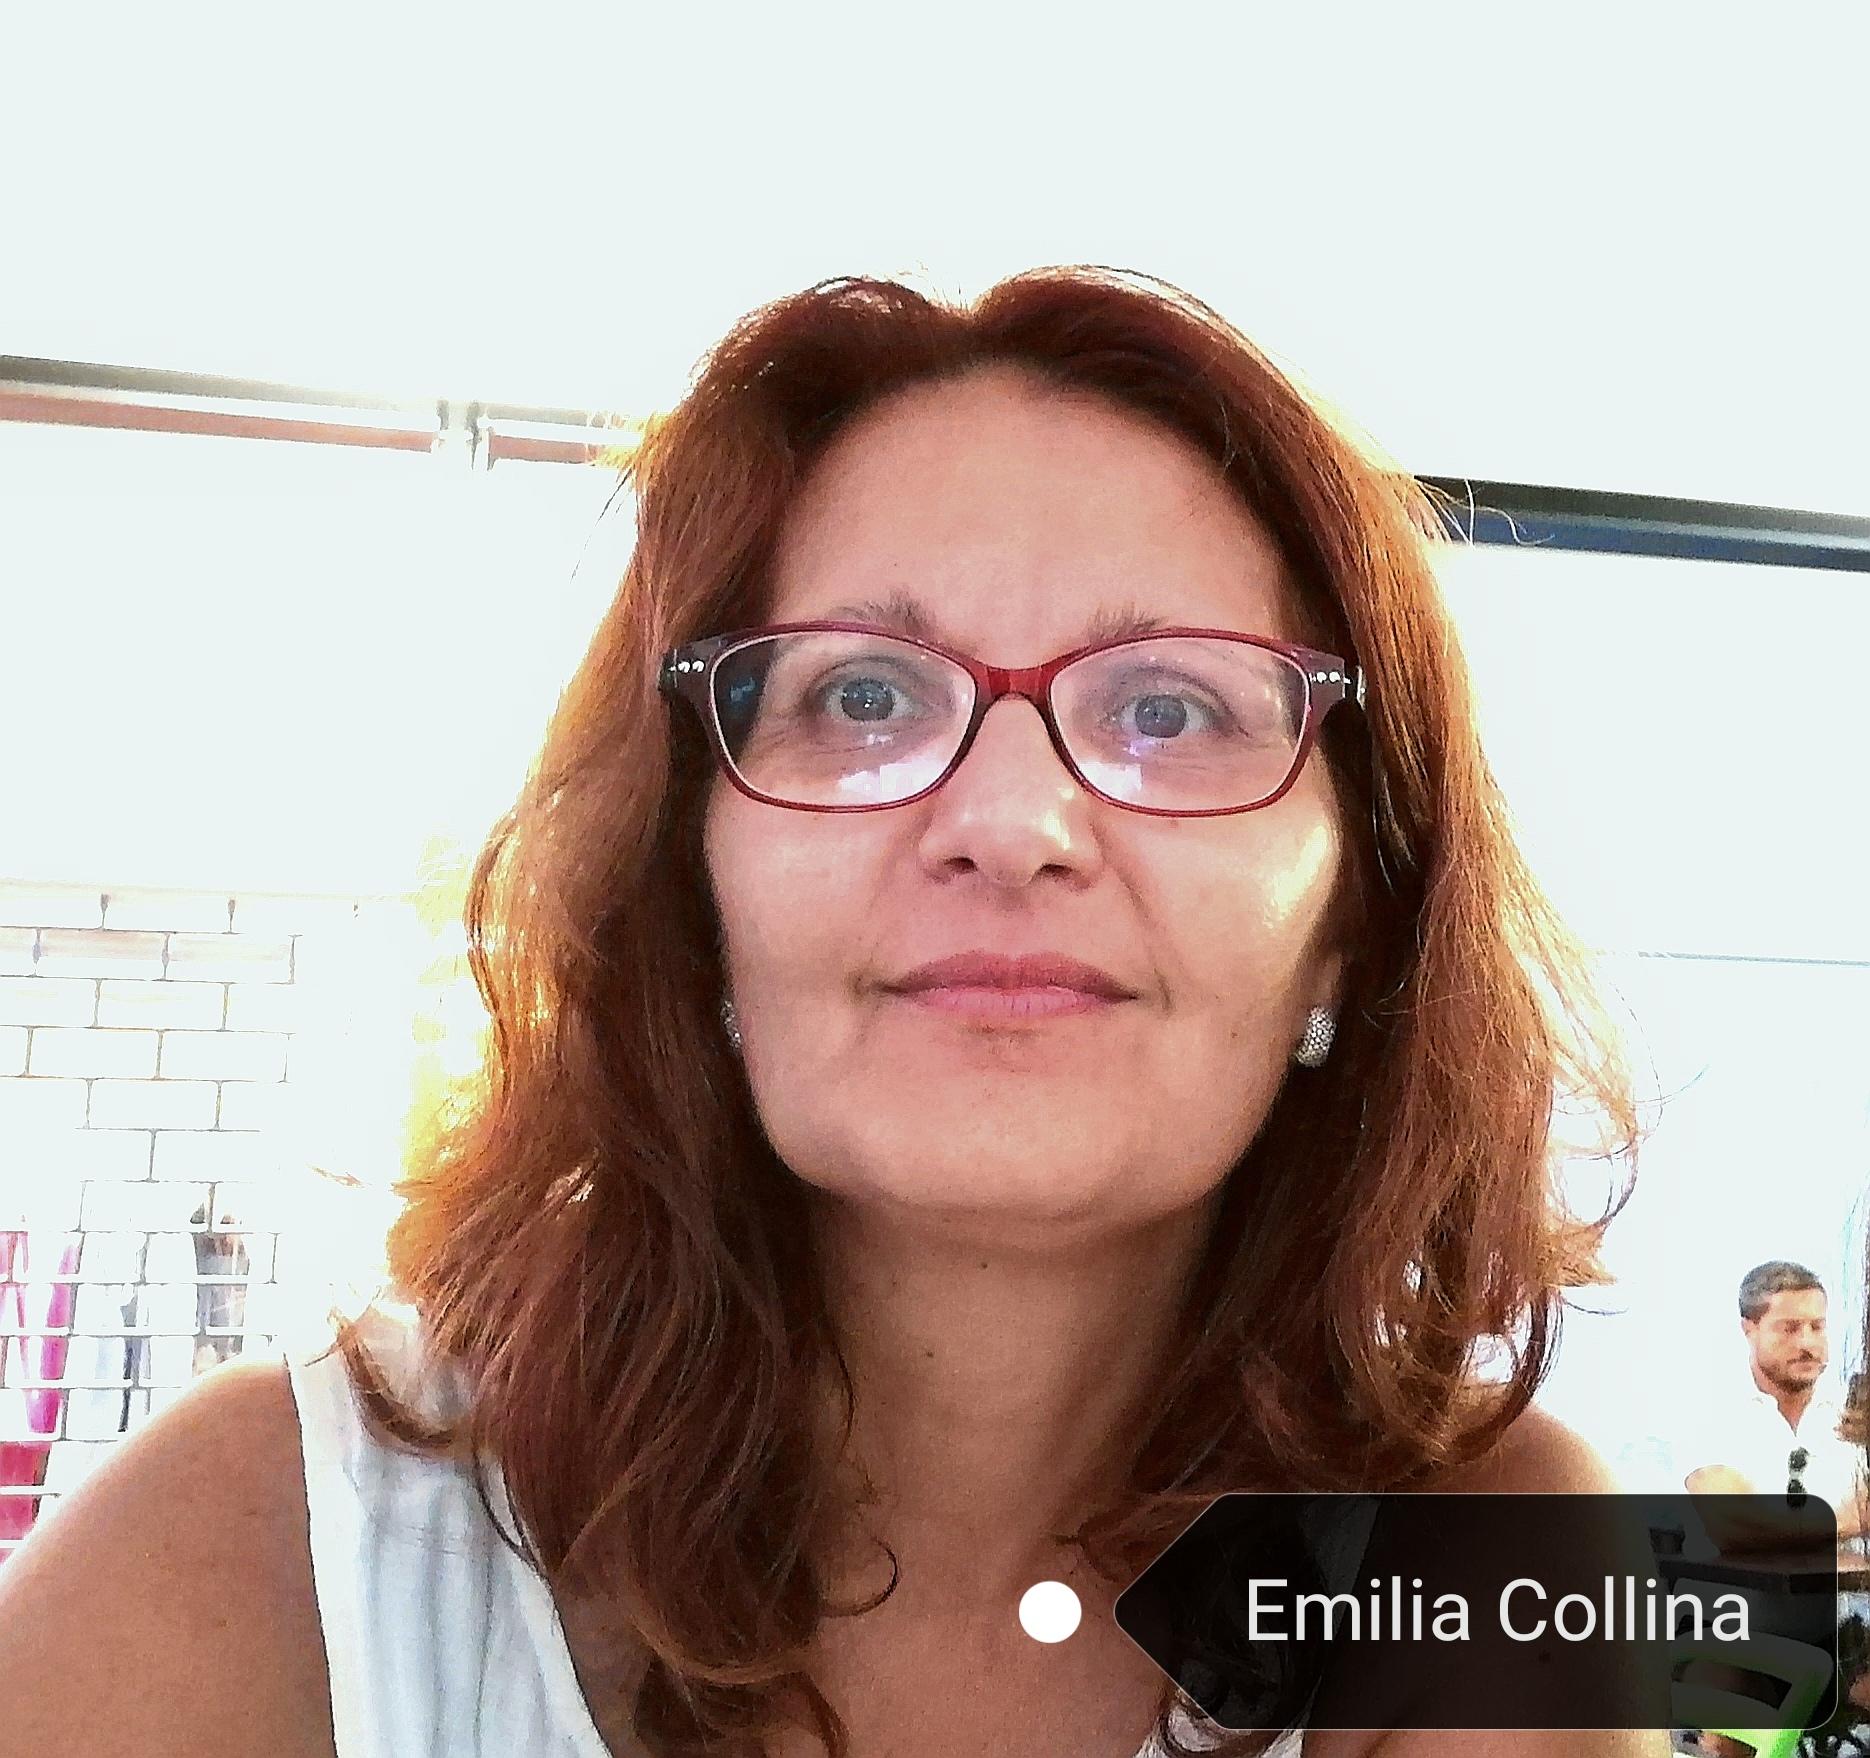 Emilia Collina